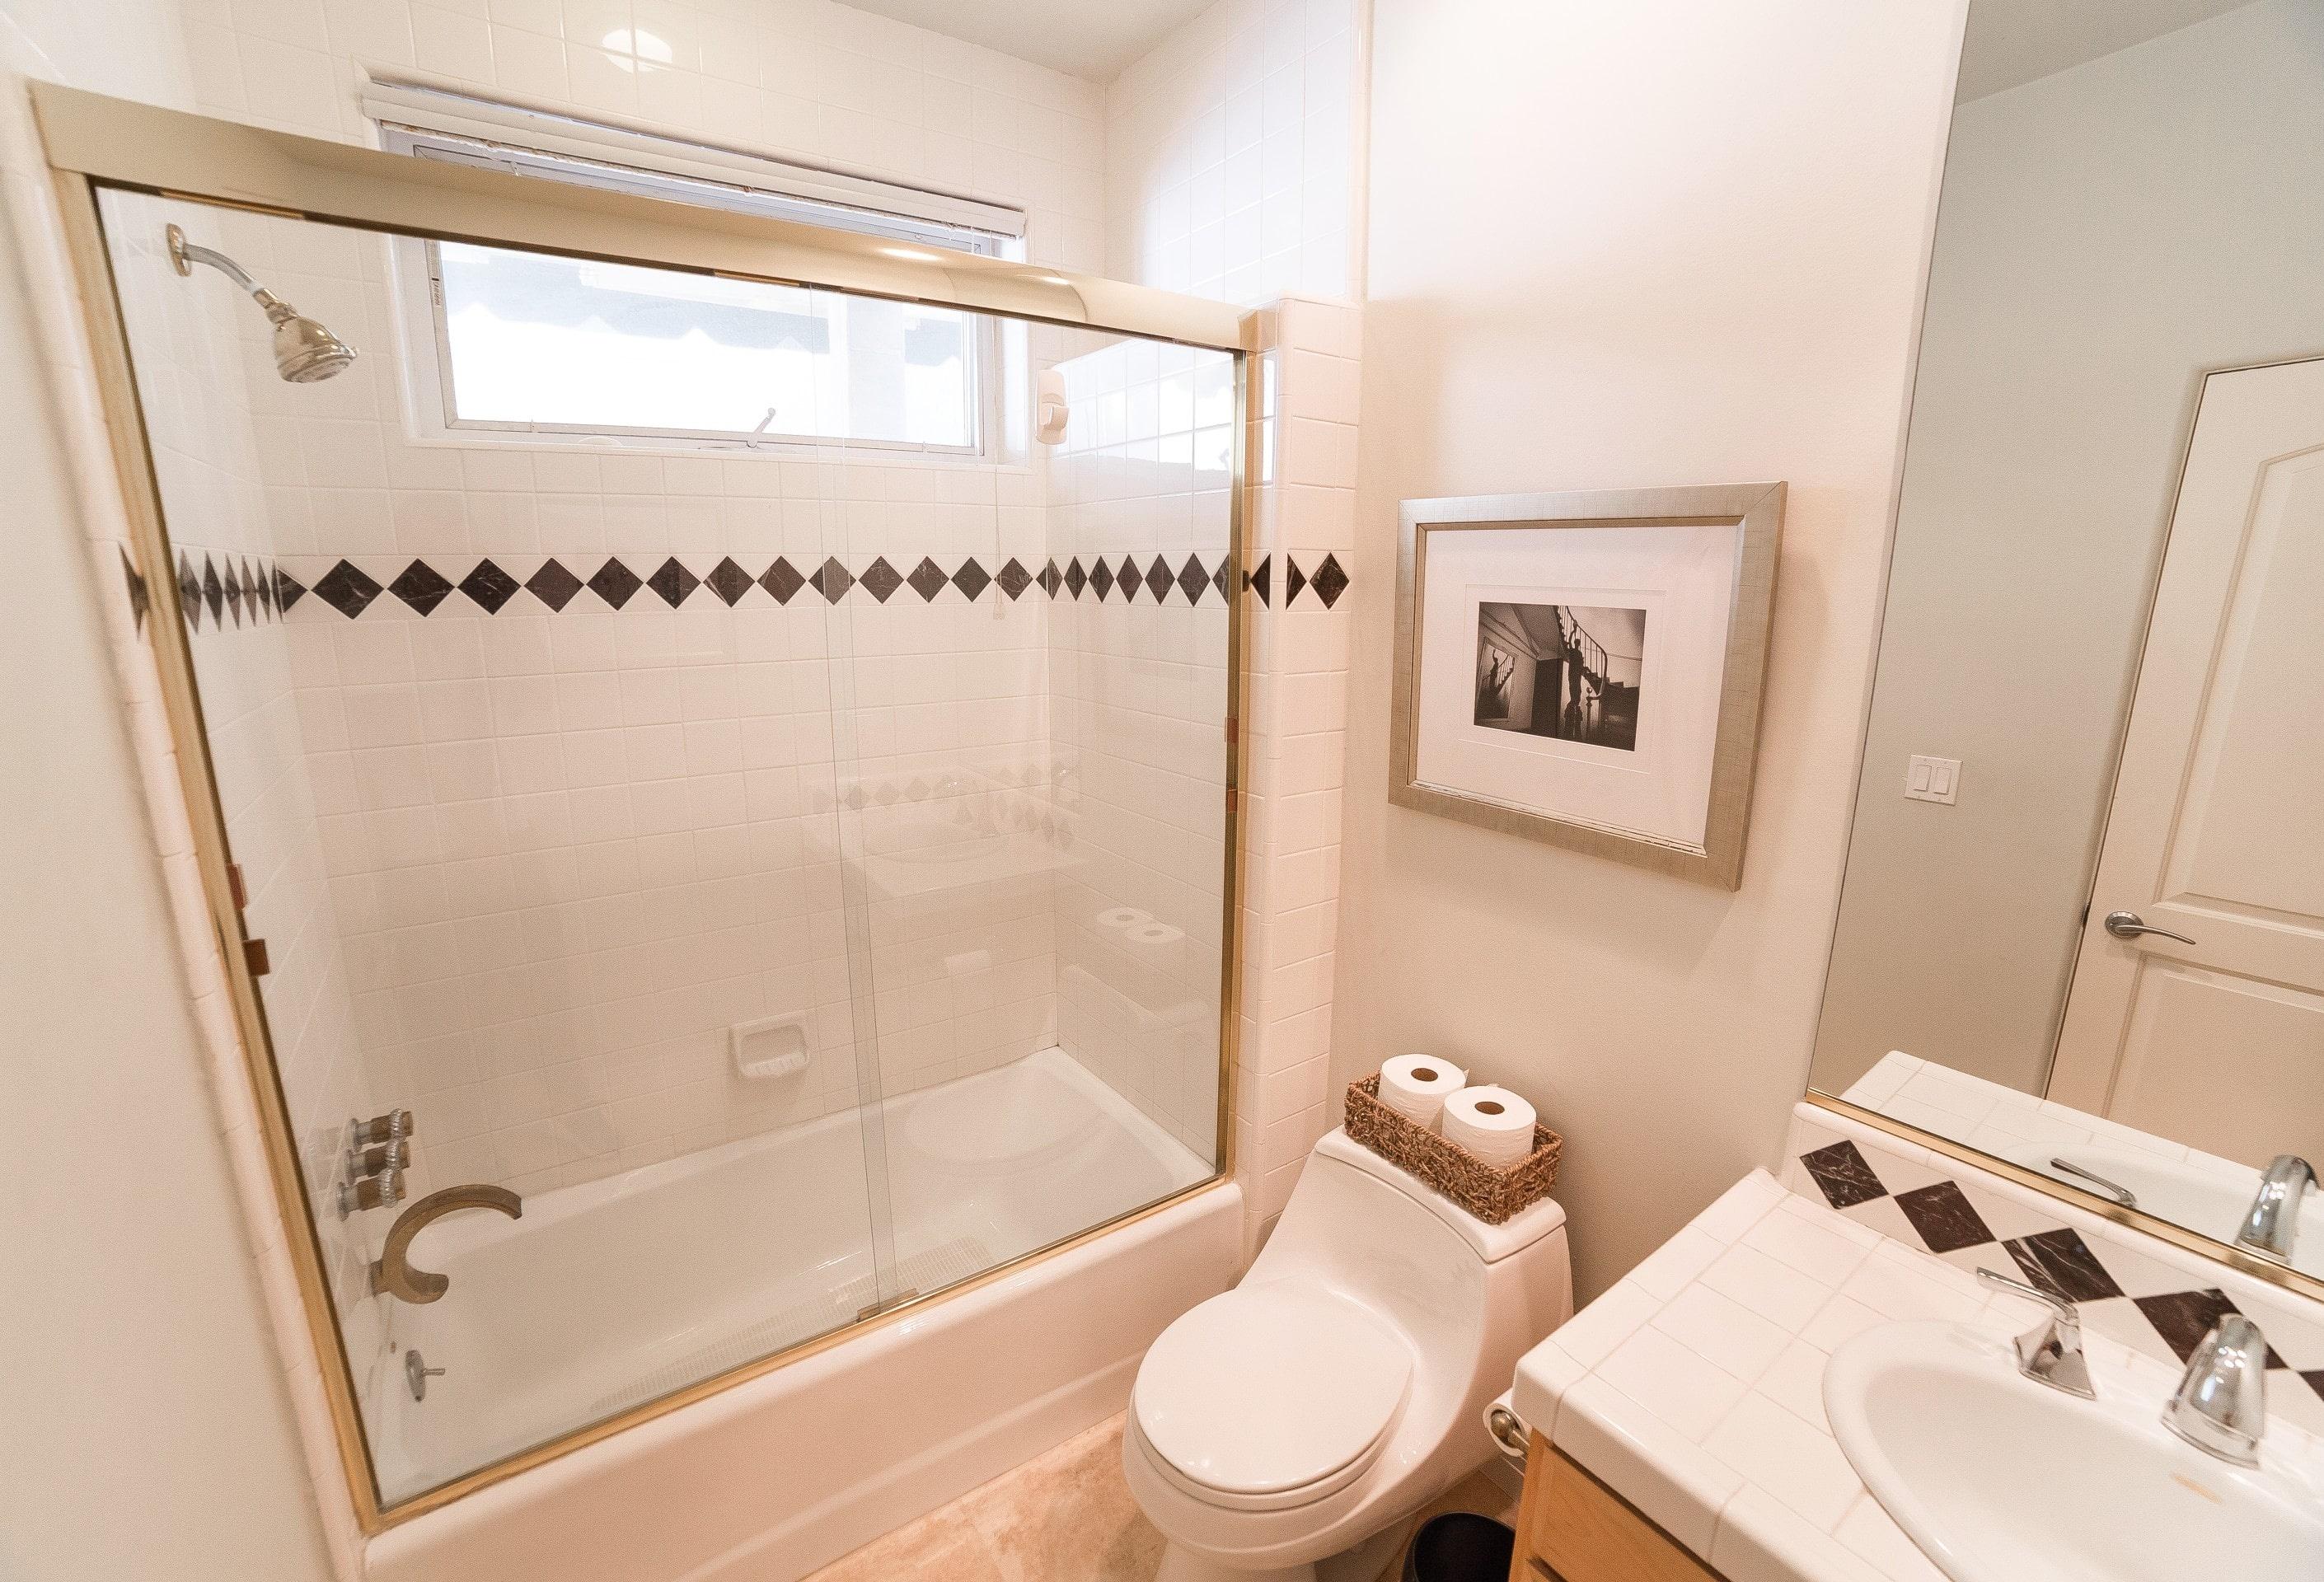 MB Townhouse Bathroom 1